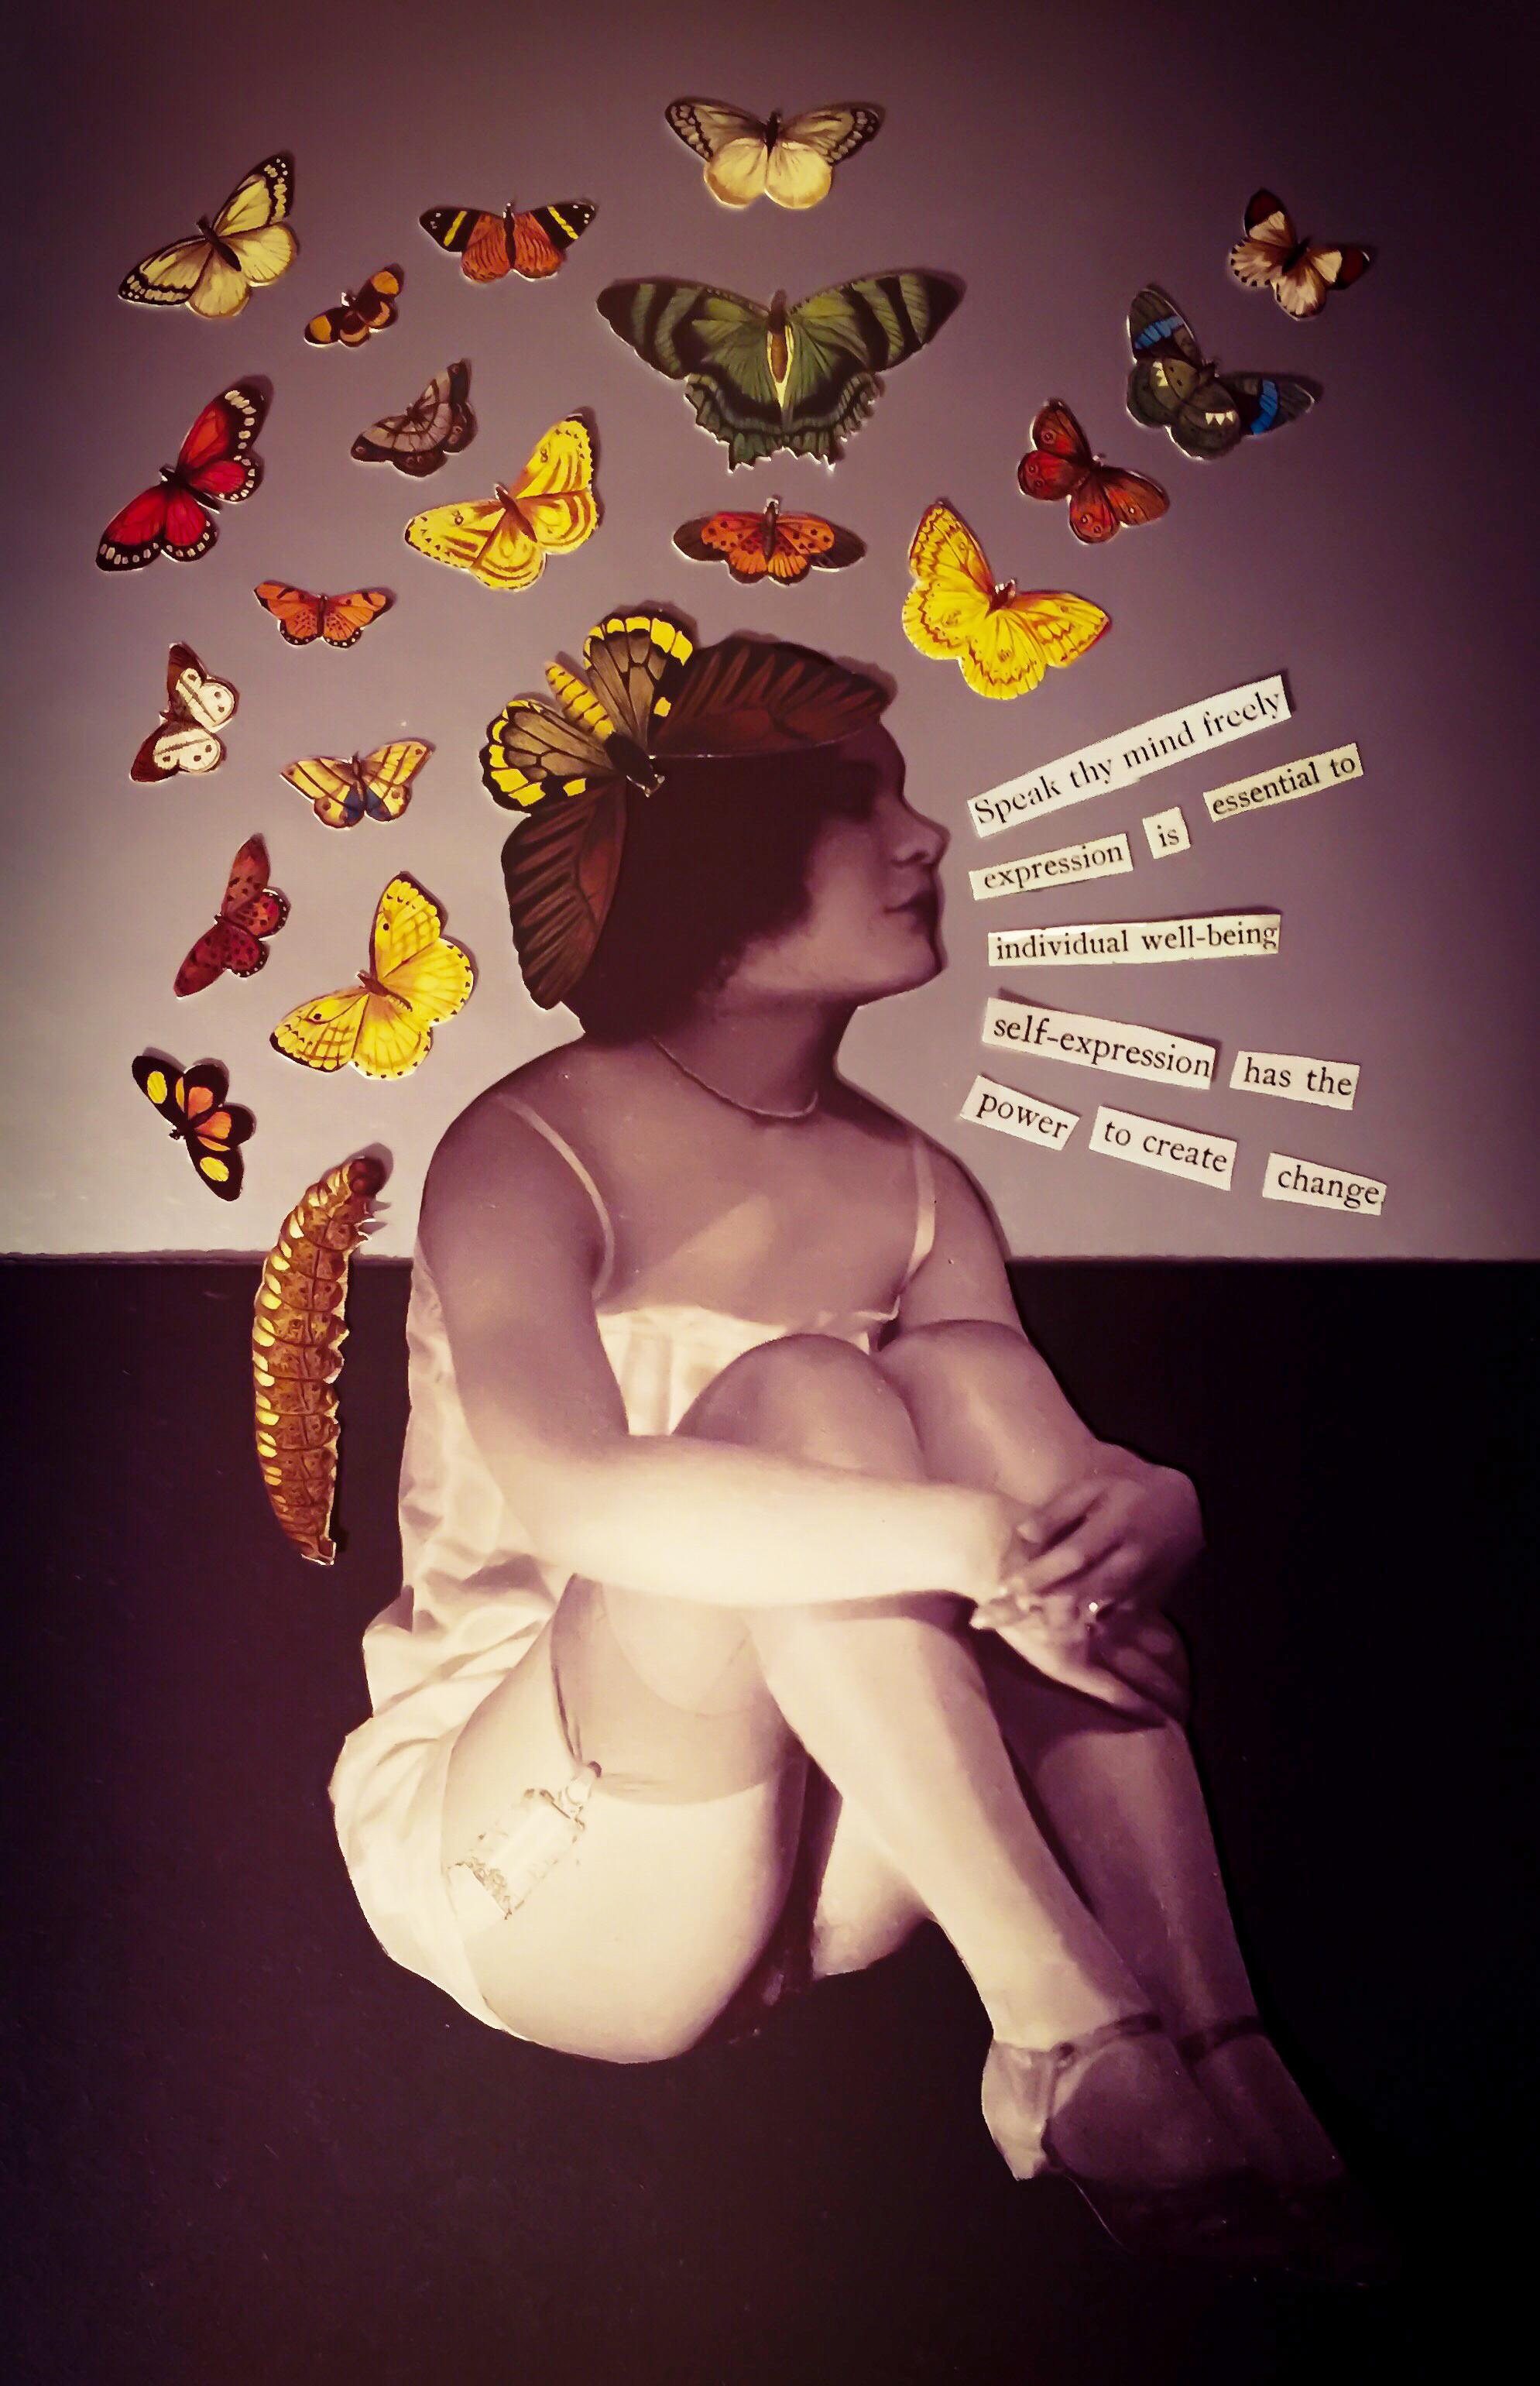 Speak Thy Mind Freely by Joan Pope (sexdeathrebirth)